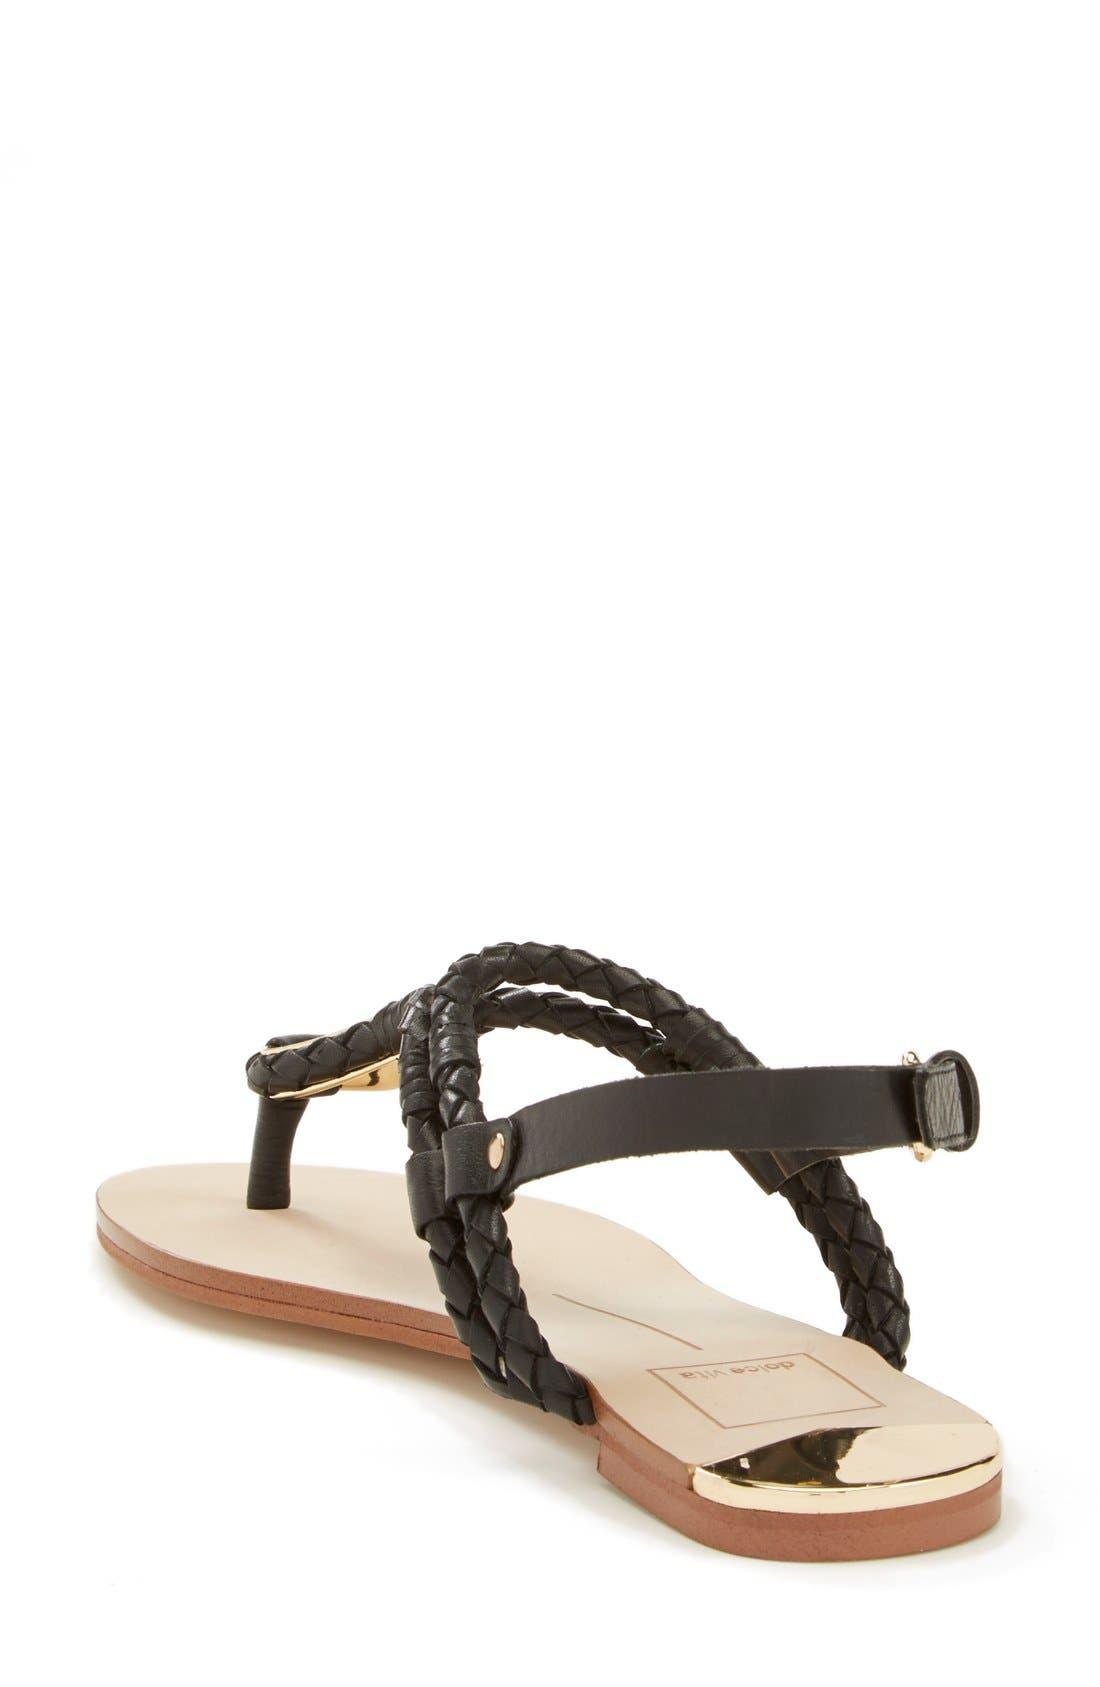 'Dixin' Thong Sandal,                             Alternate thumbnail 3, color,                             004